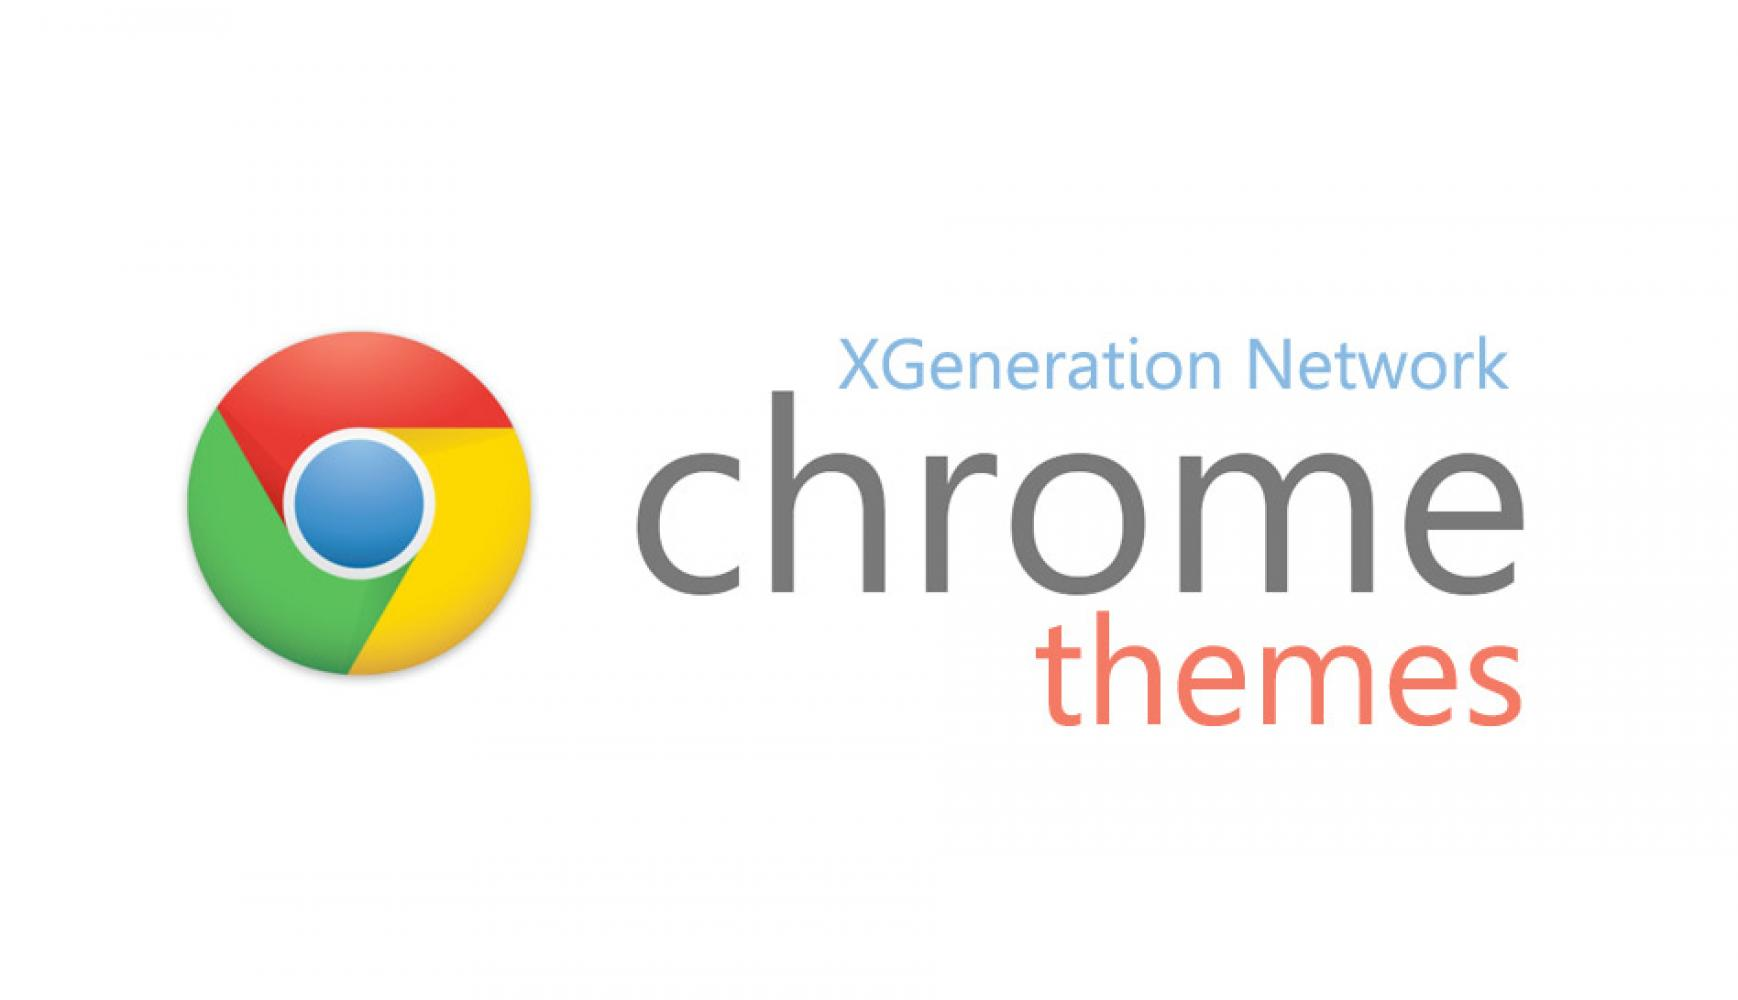 XGeneration Network Google Chrome Themes